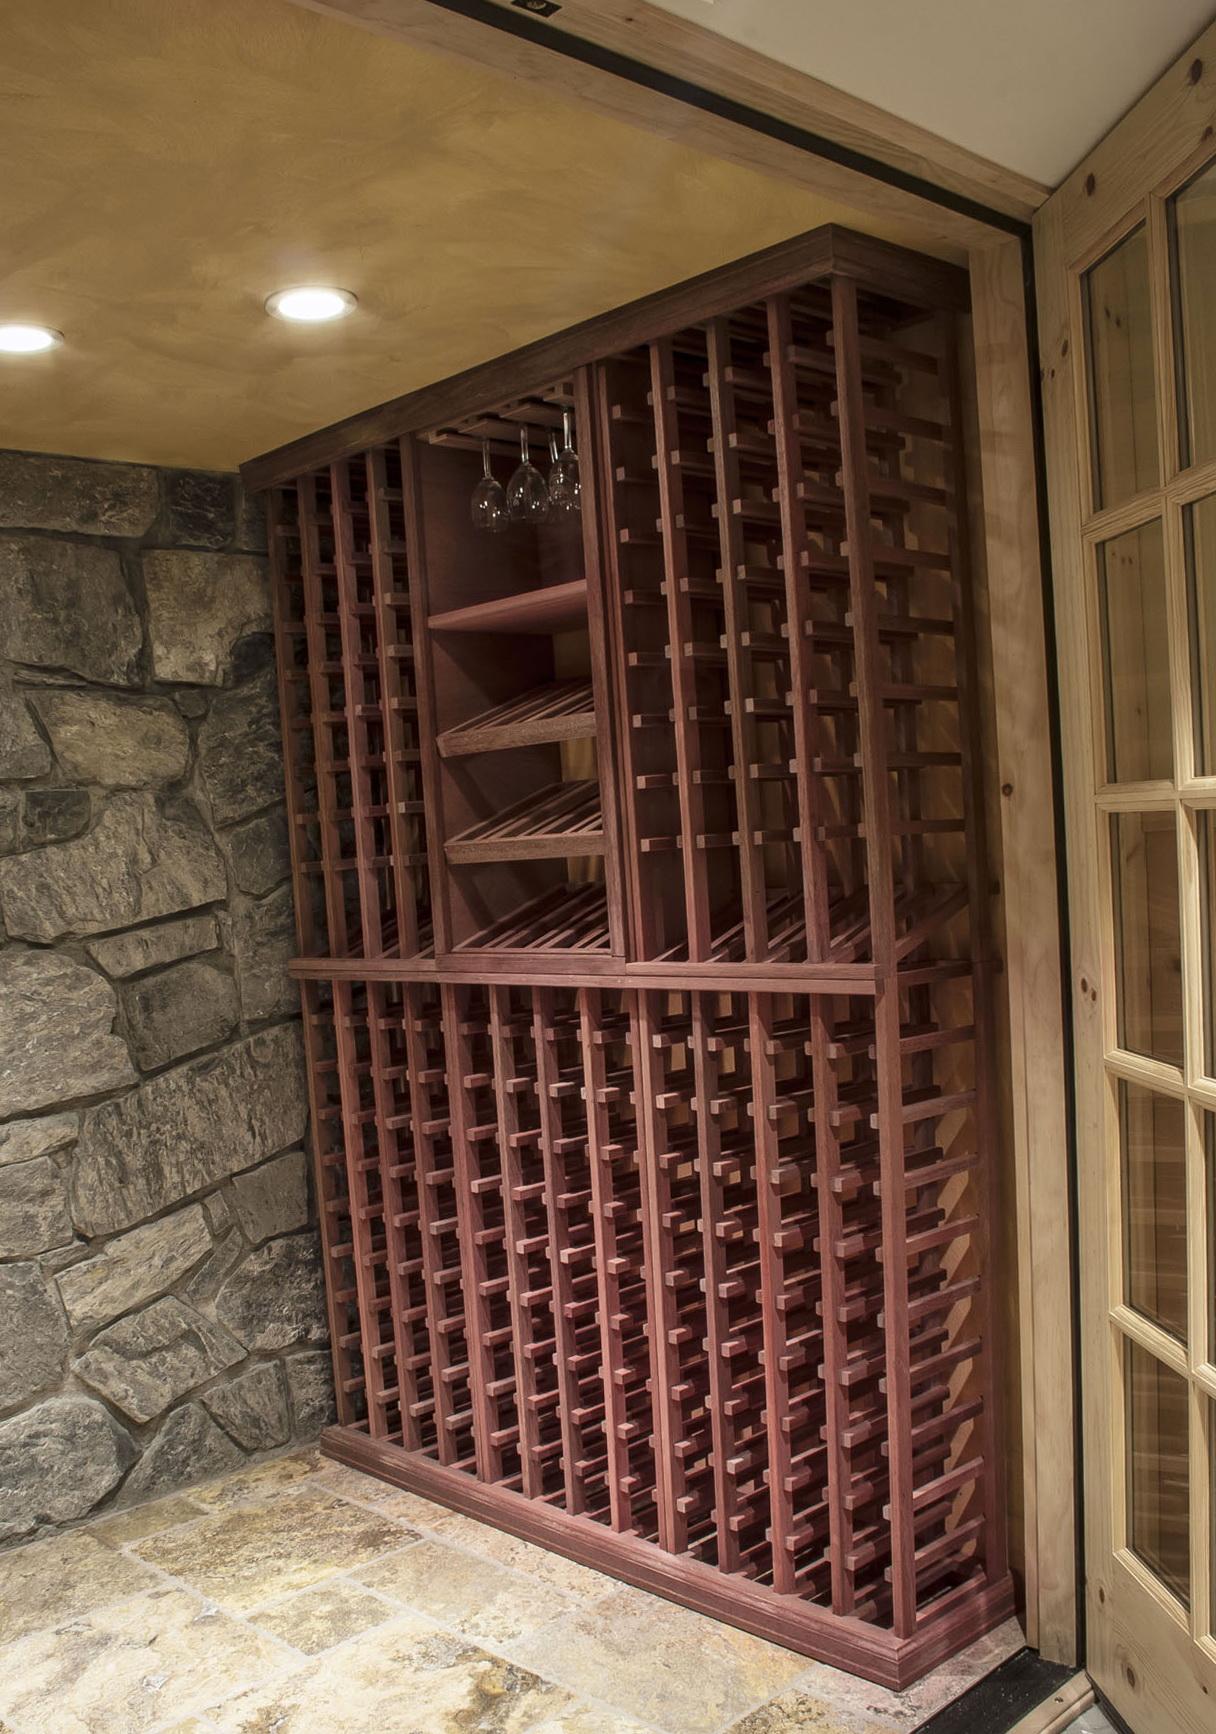 Permalink to Diy Wine Cellar Racks